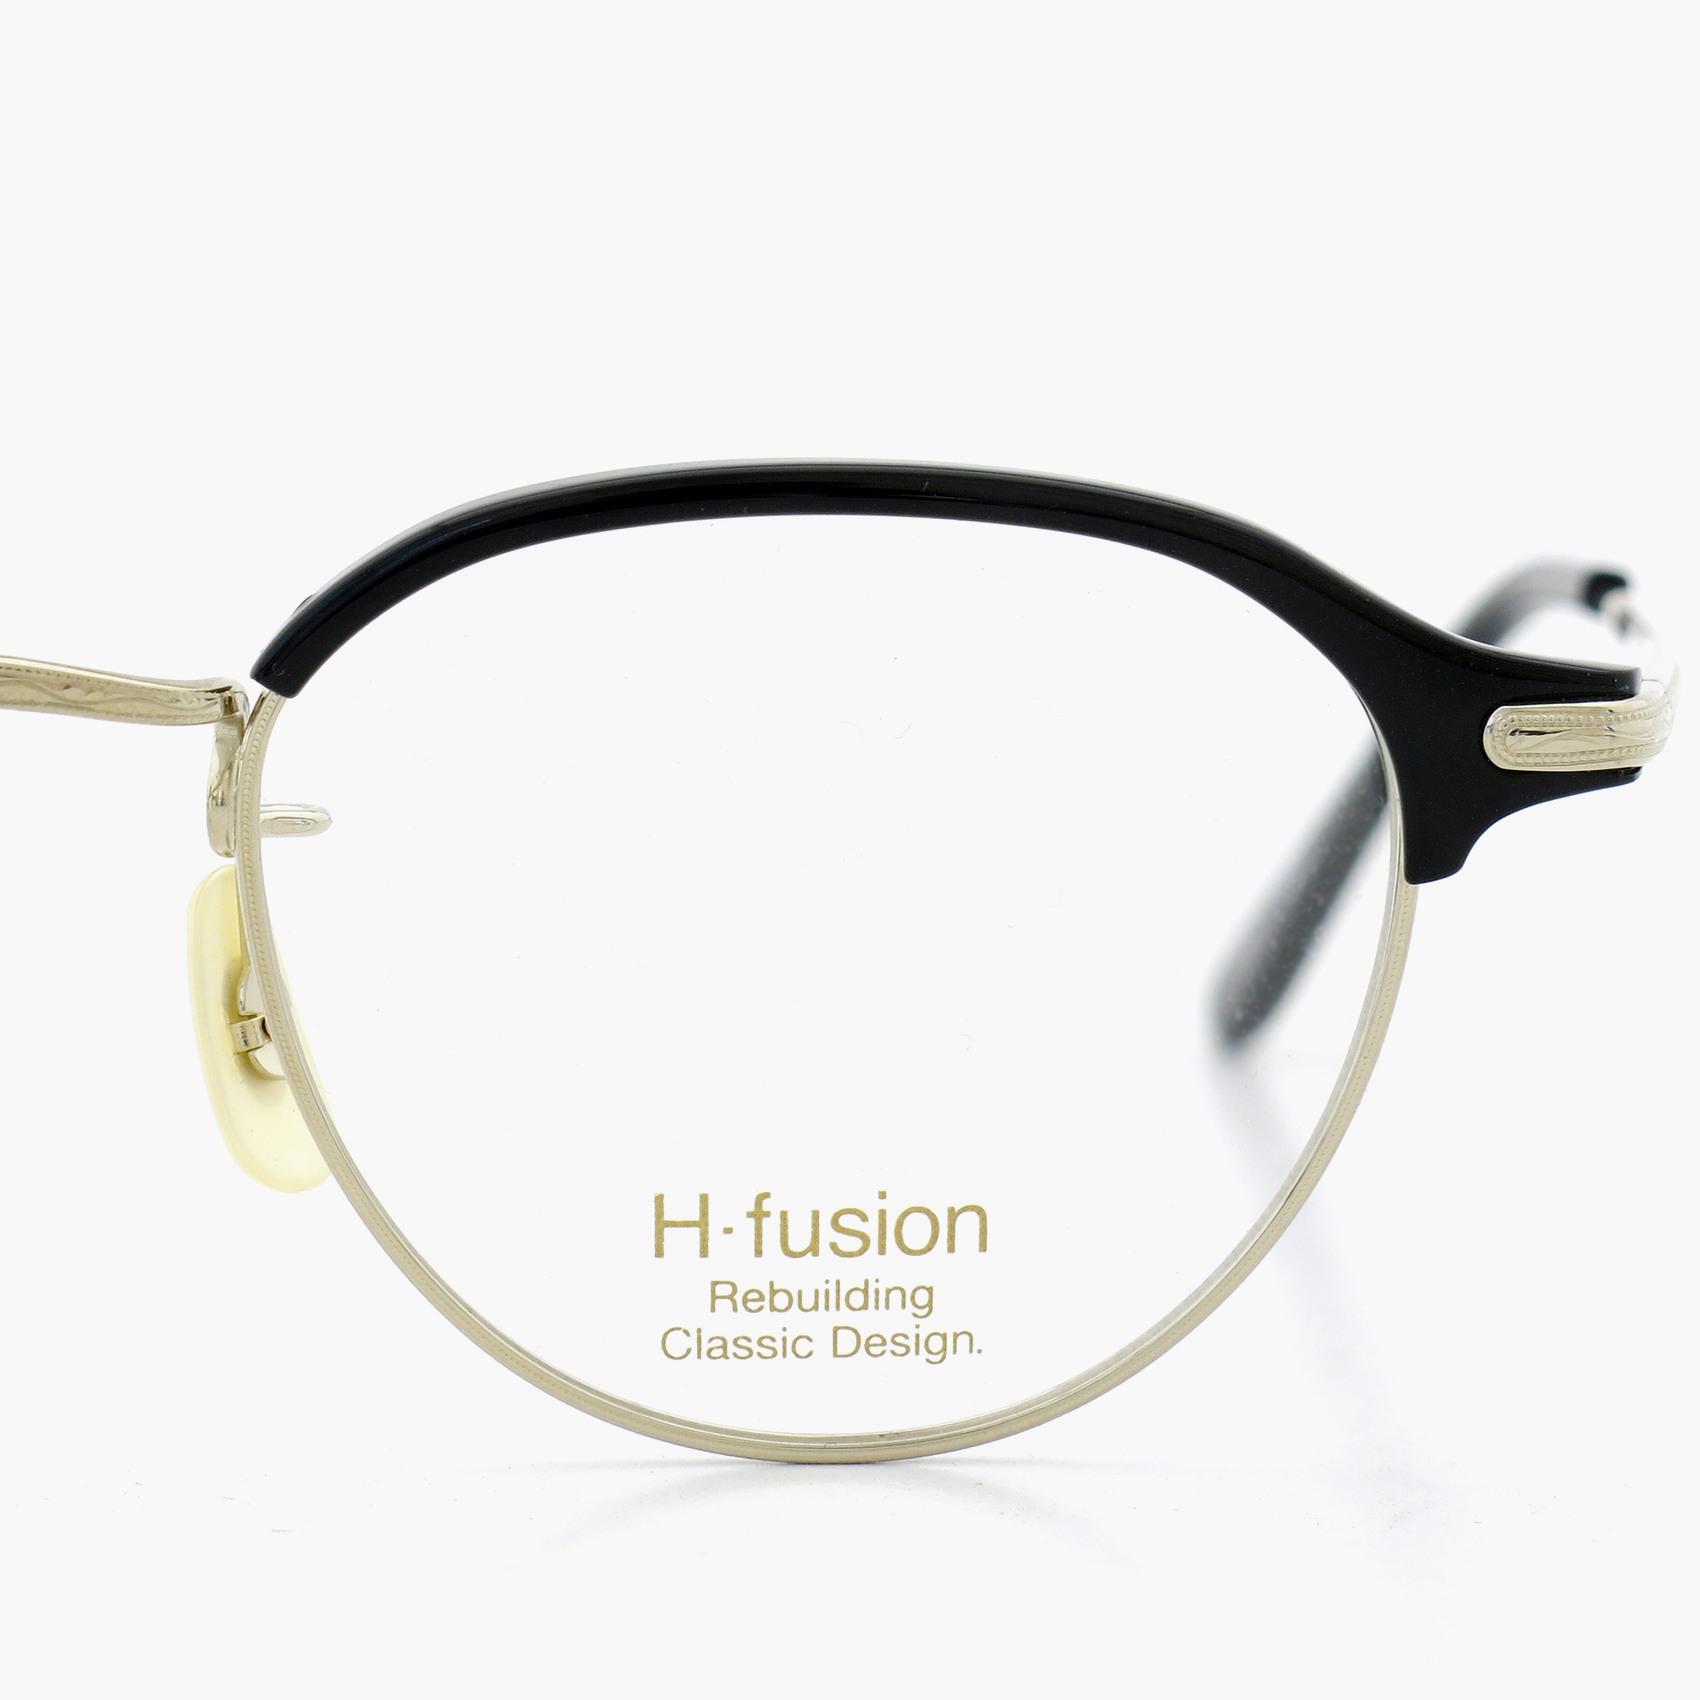 151211-h-fusion-01